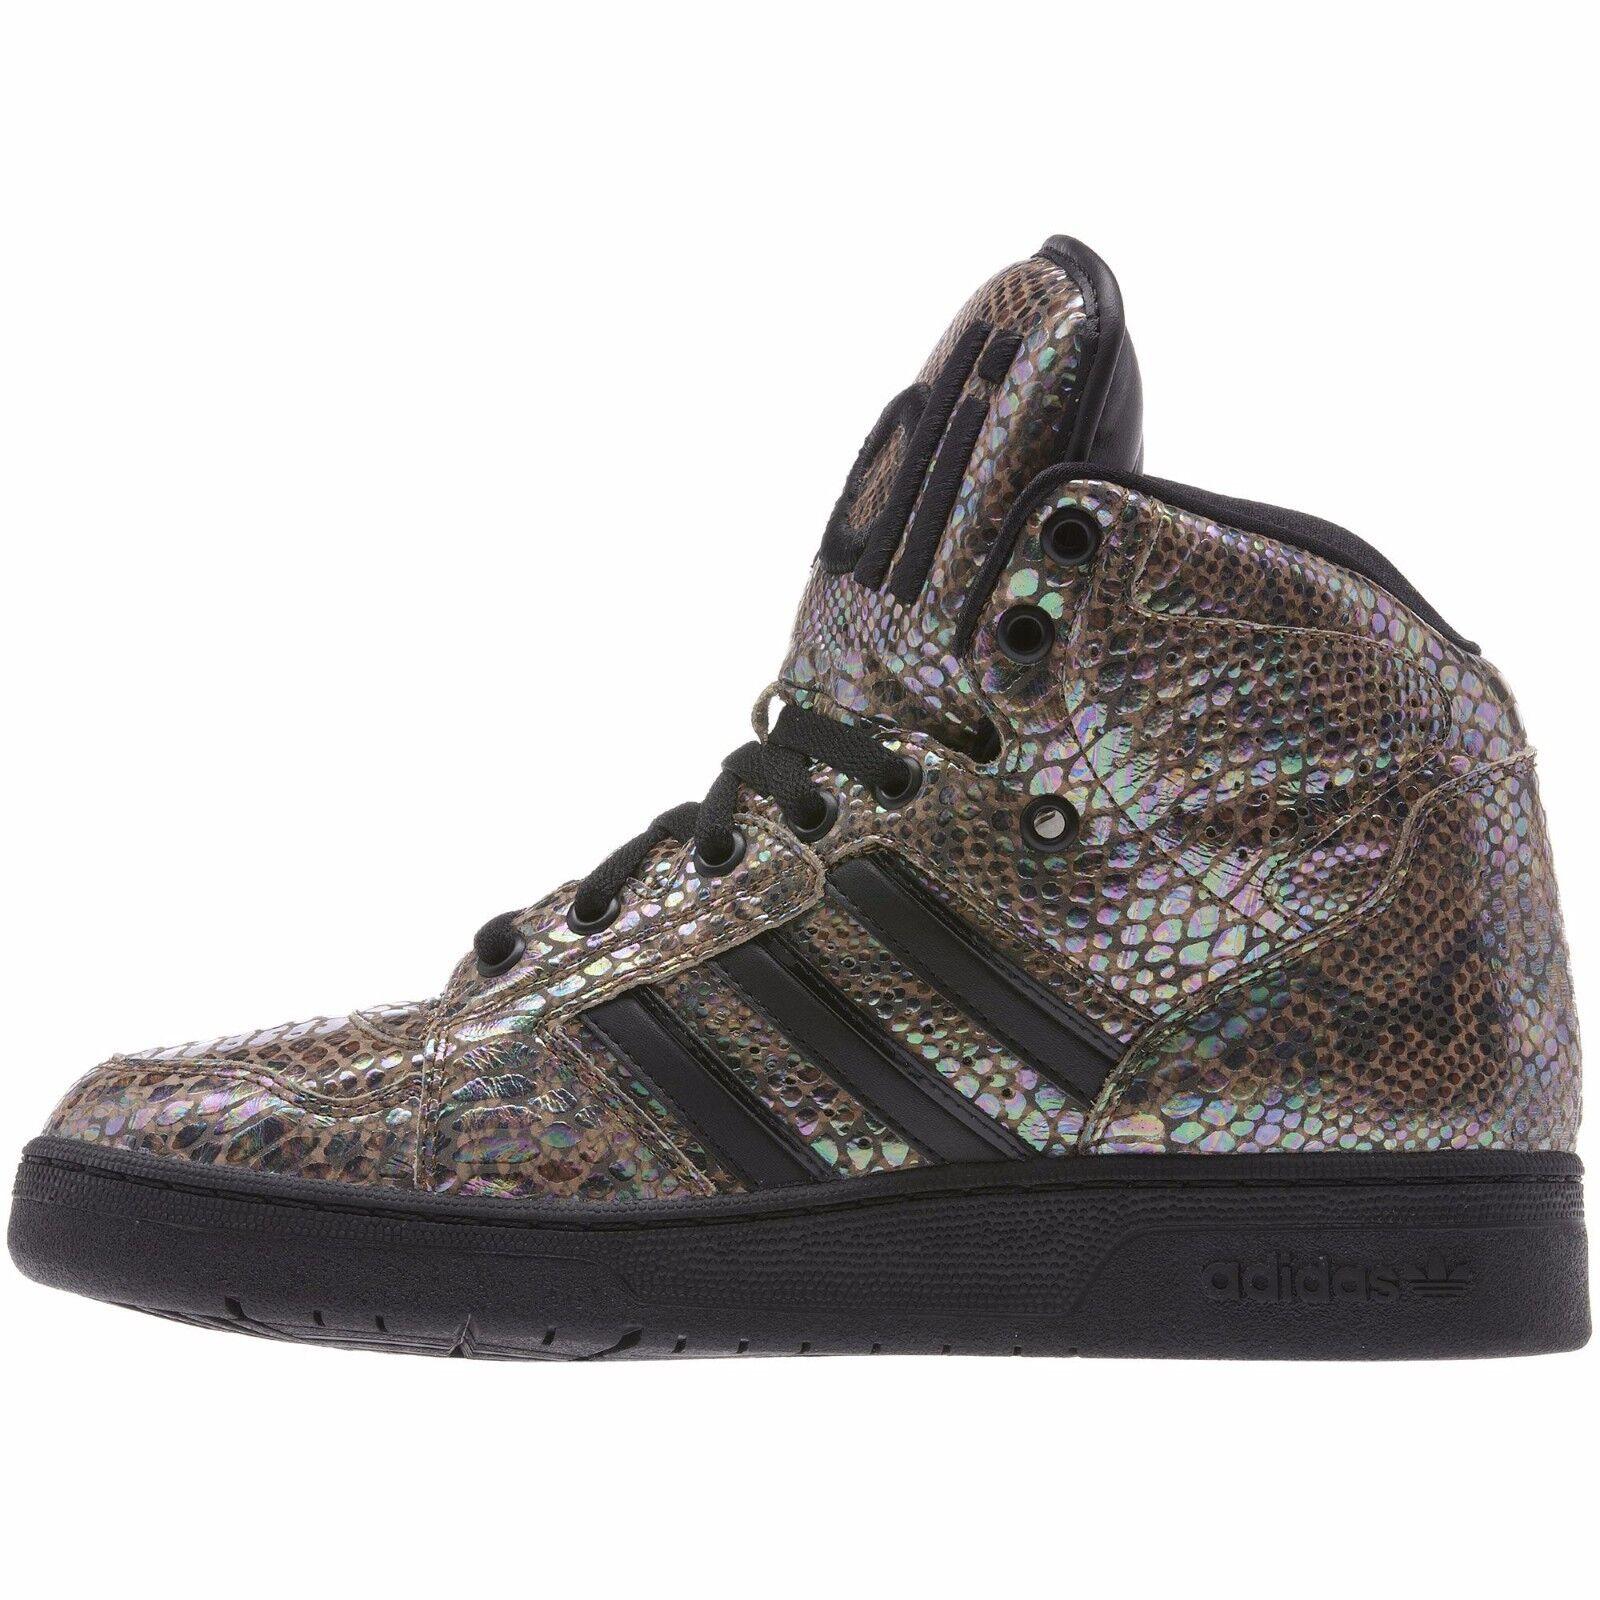 Adidas Originals Jeremy Scott Instinct High Rainbow G95753 Limited Edition